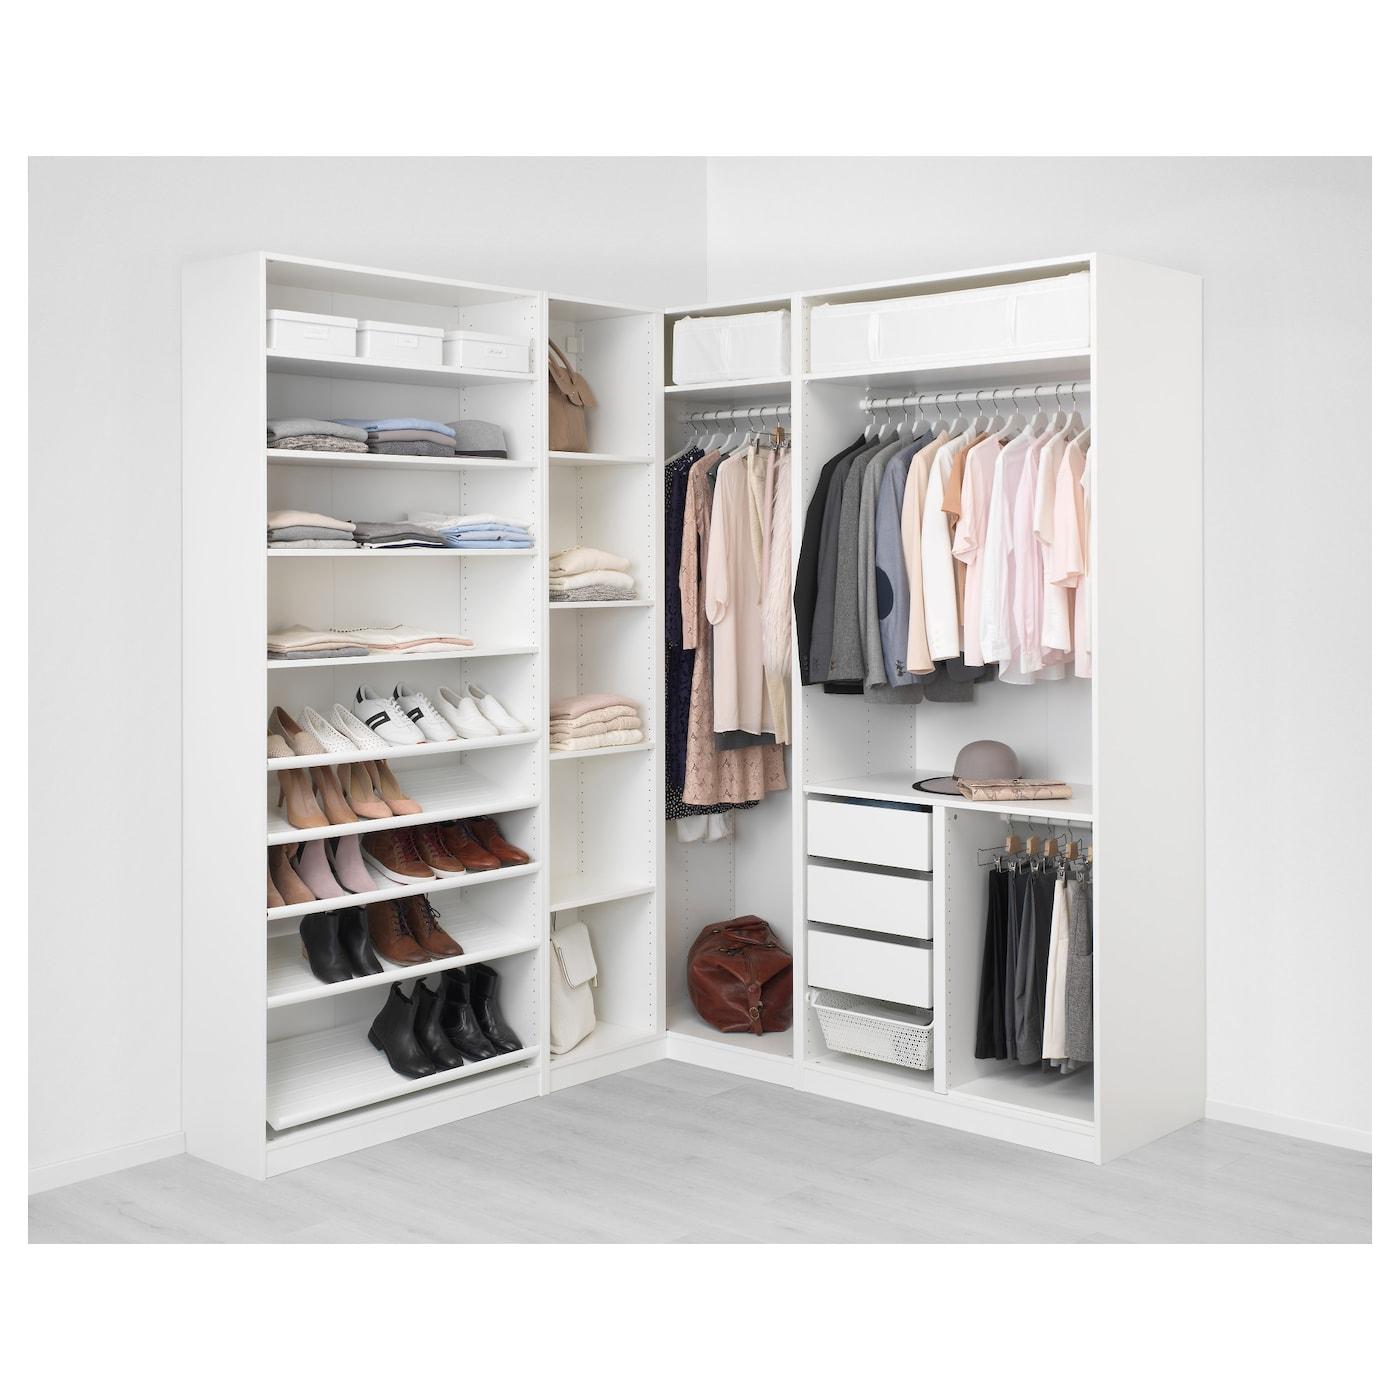 pax penderie d 39 angle blanc tyssedal tyssedal verre 210 188 x 236 cm ikea. Black Bedroom Furniture Sets. Home Design Ideas